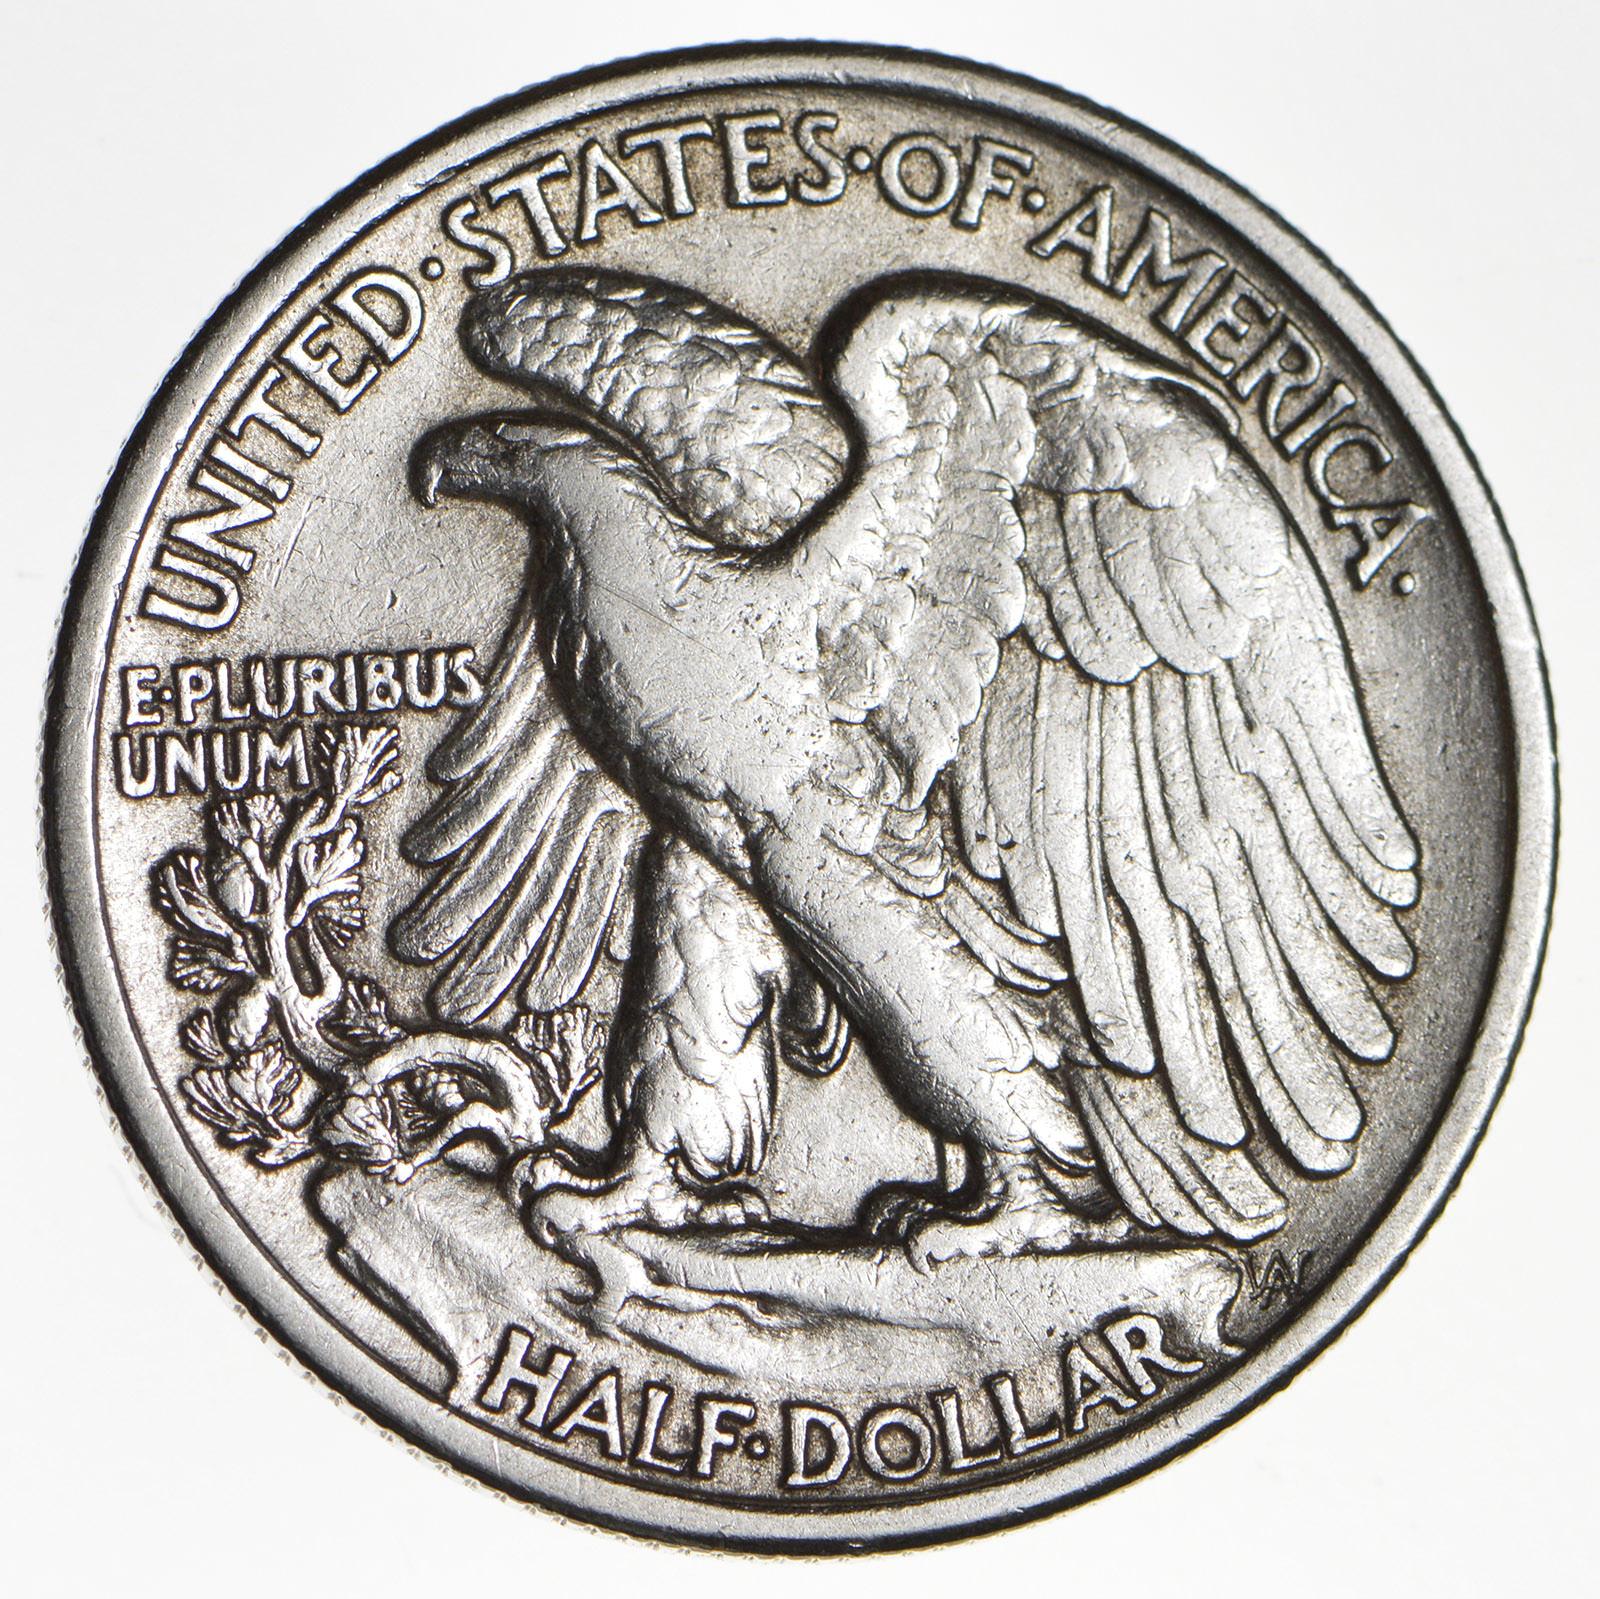 1935 liberty coin